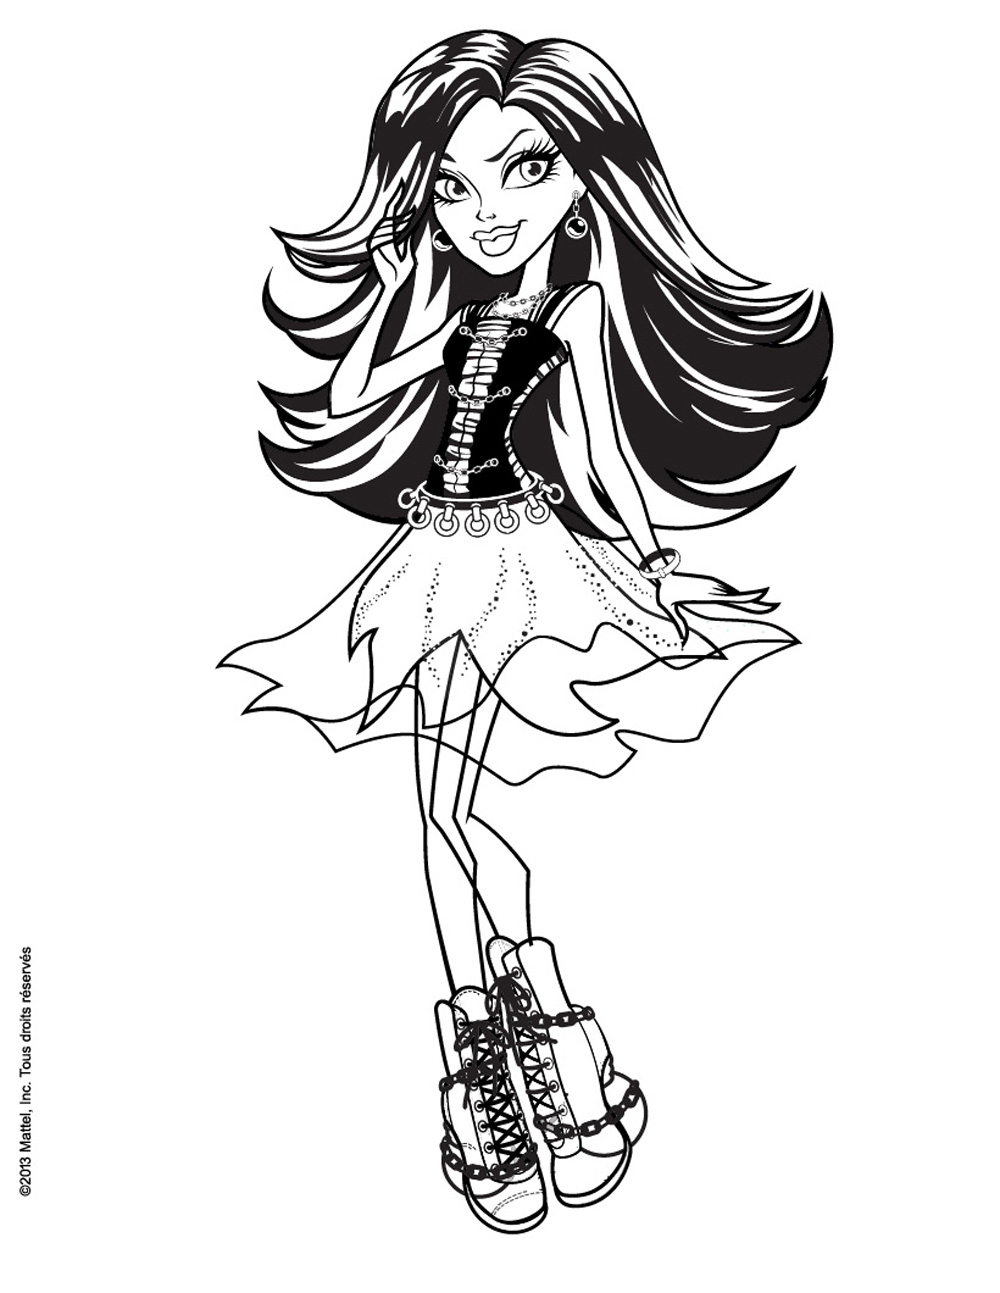 Belle Jeux De Coloriage De Monster High | Imprimer Et dedans Dessin A Imprimer Monster High ...